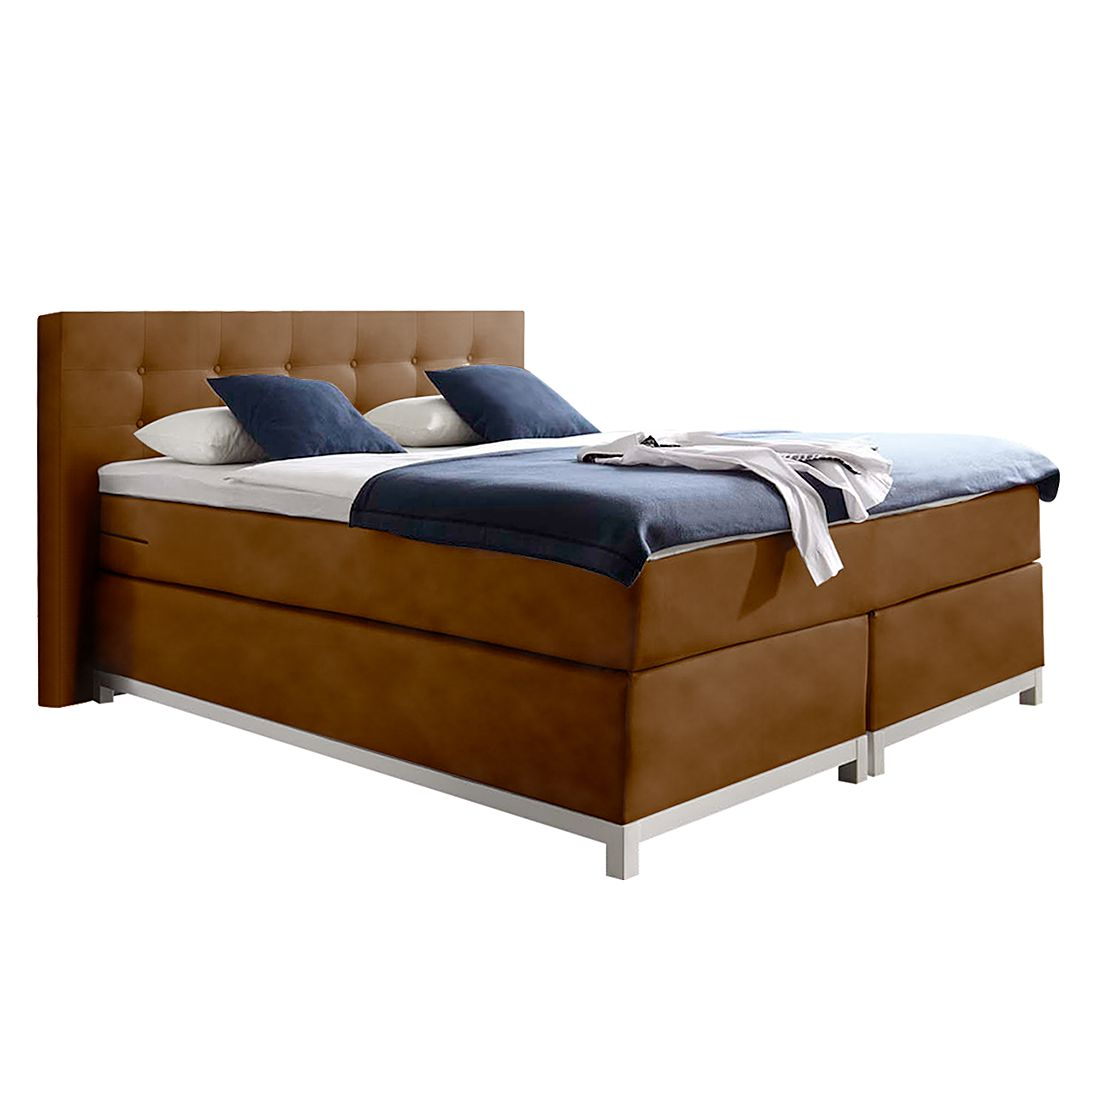 boxspringbett male kunstleder 100 x 200cm h3 ab 80. Black Bedroom Furniture Sets. Home Design Ideas